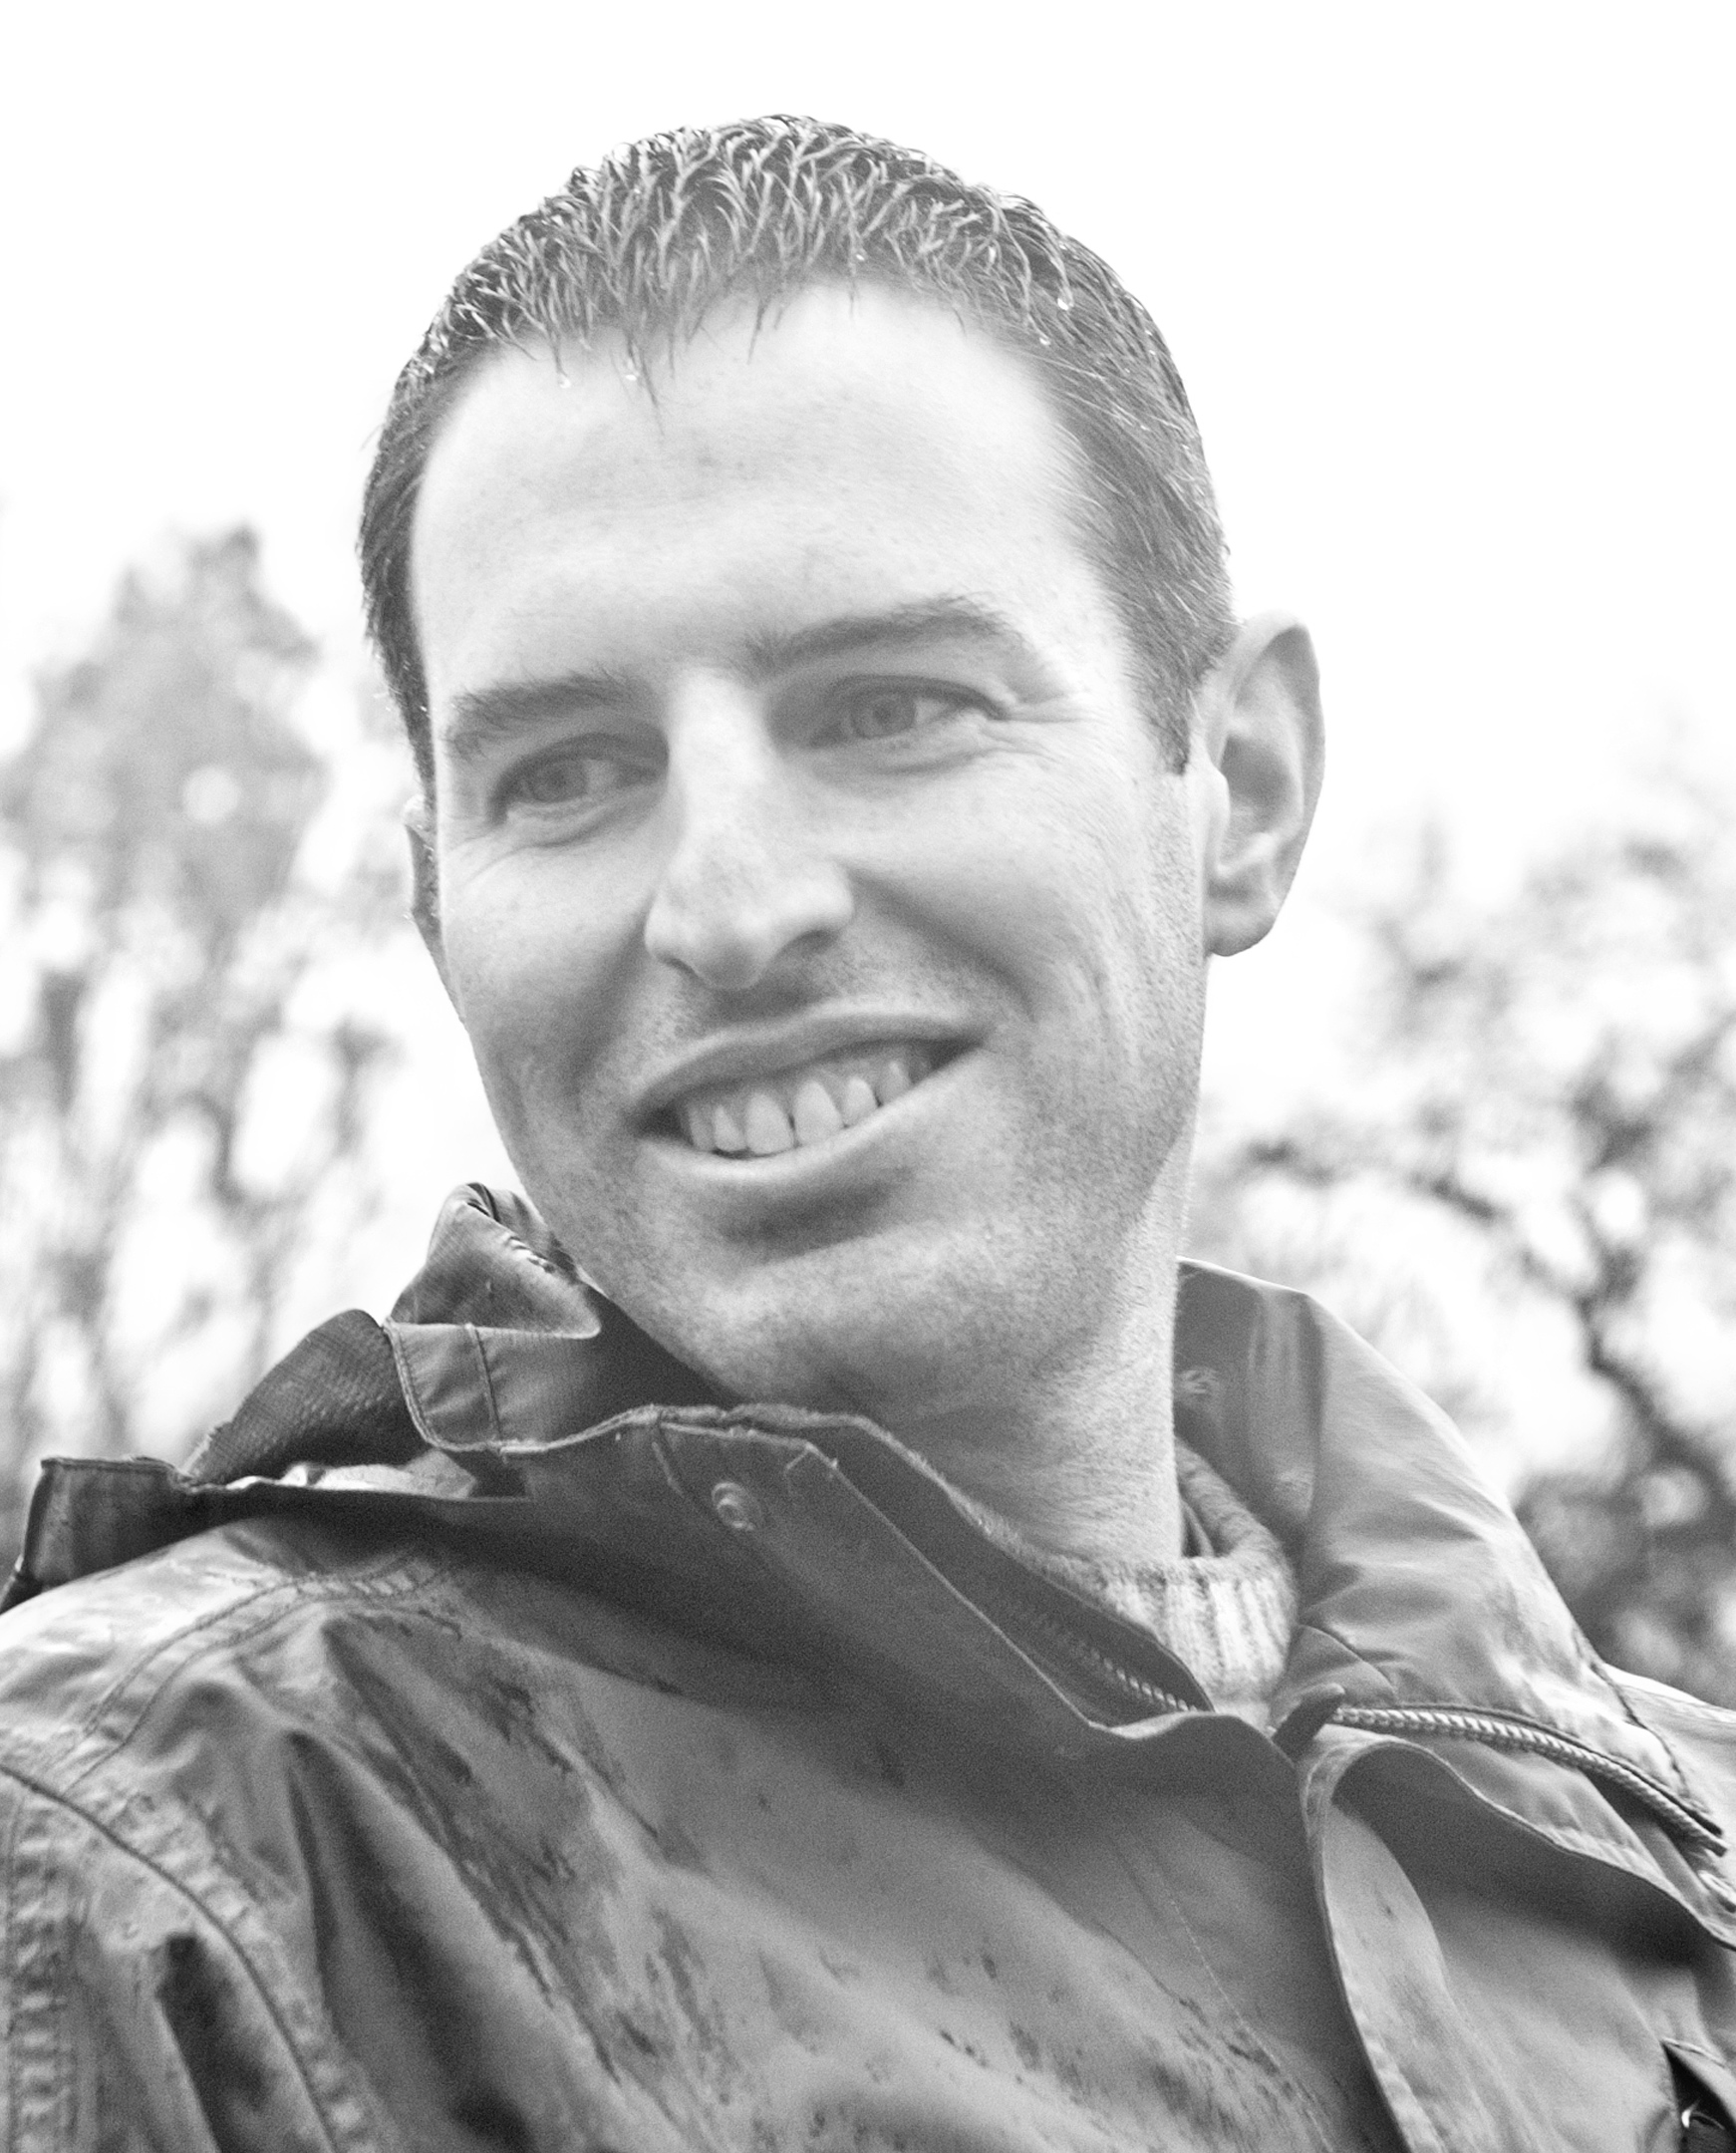 Anthony Graziani